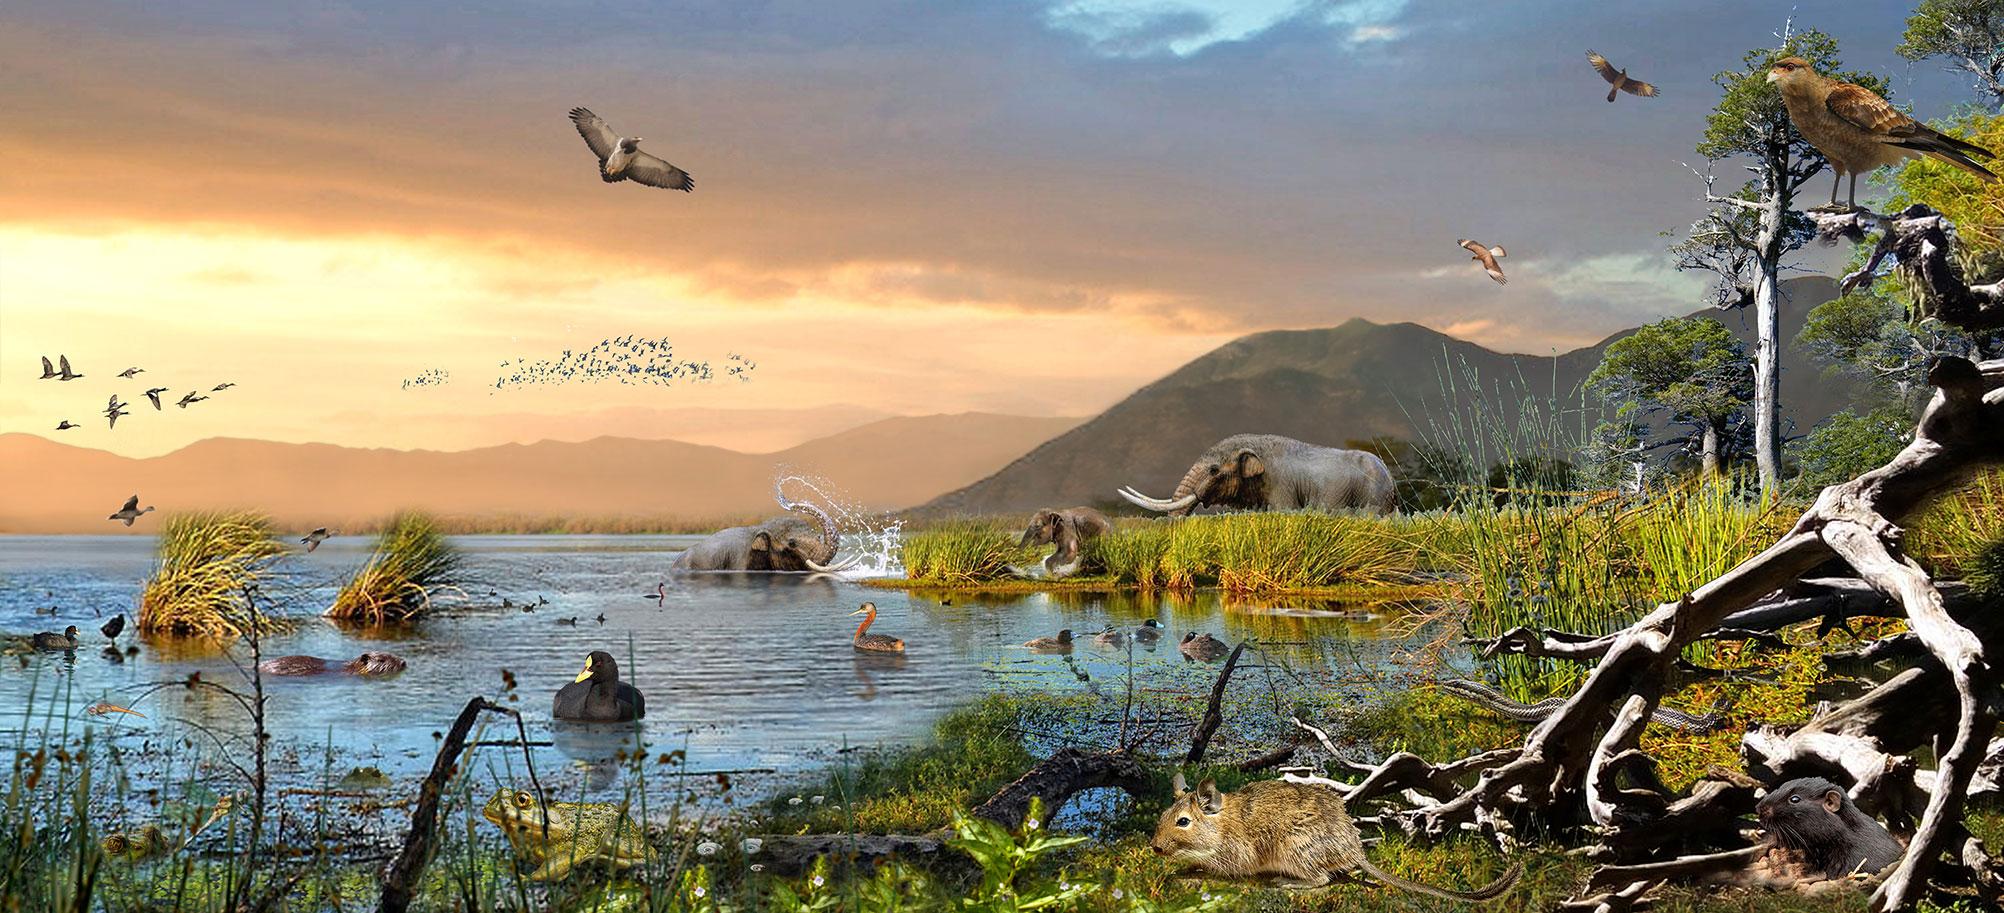 (Paisaje Fauna Laguna Tagua Tagua: Autor Mauricio Álvarez, proporcionada por NITT)